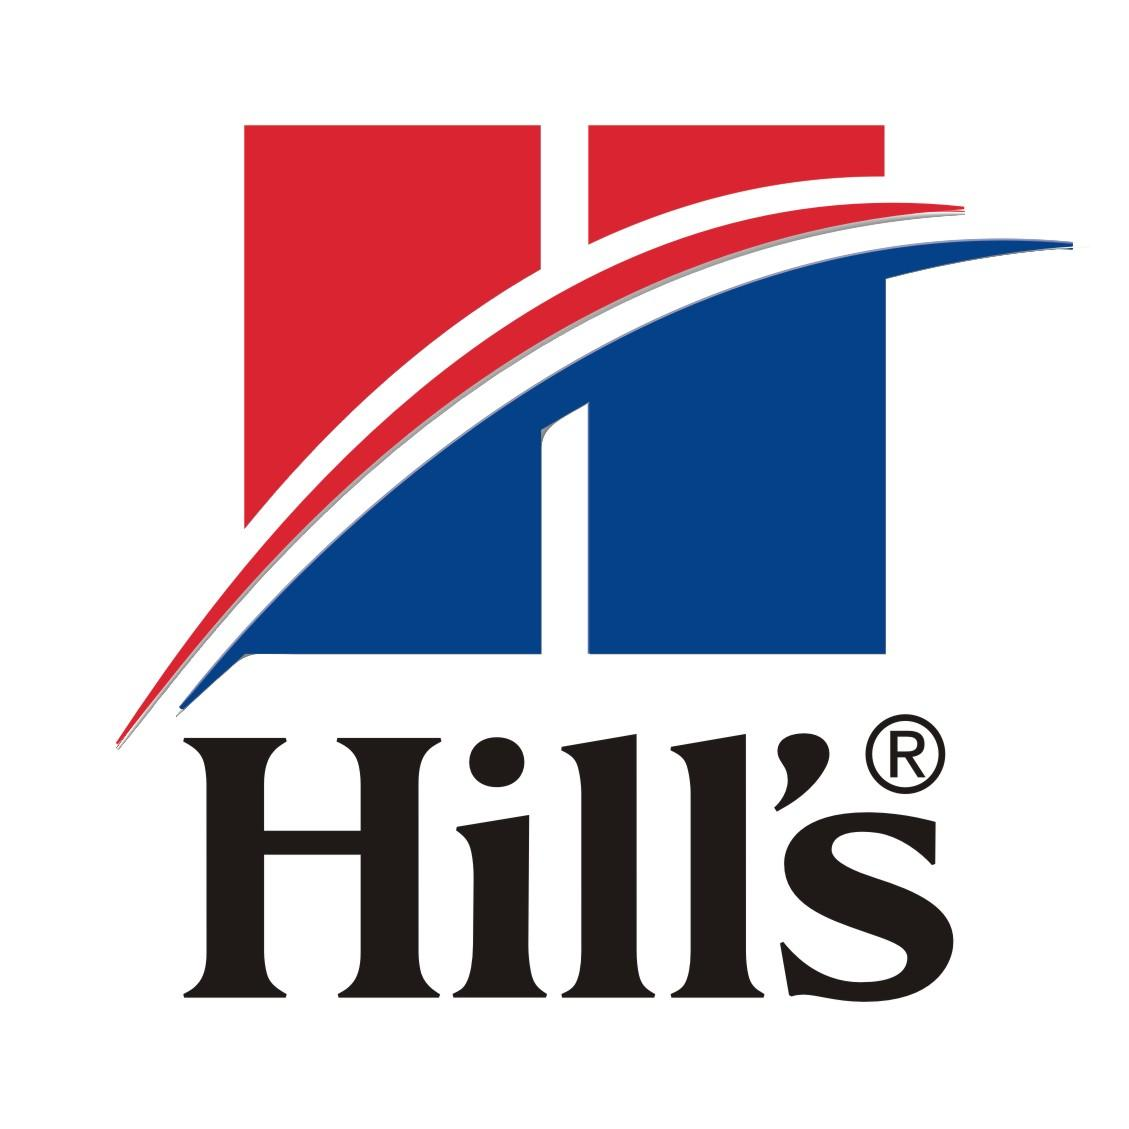 hills-pet-foods_logo_428.jpg